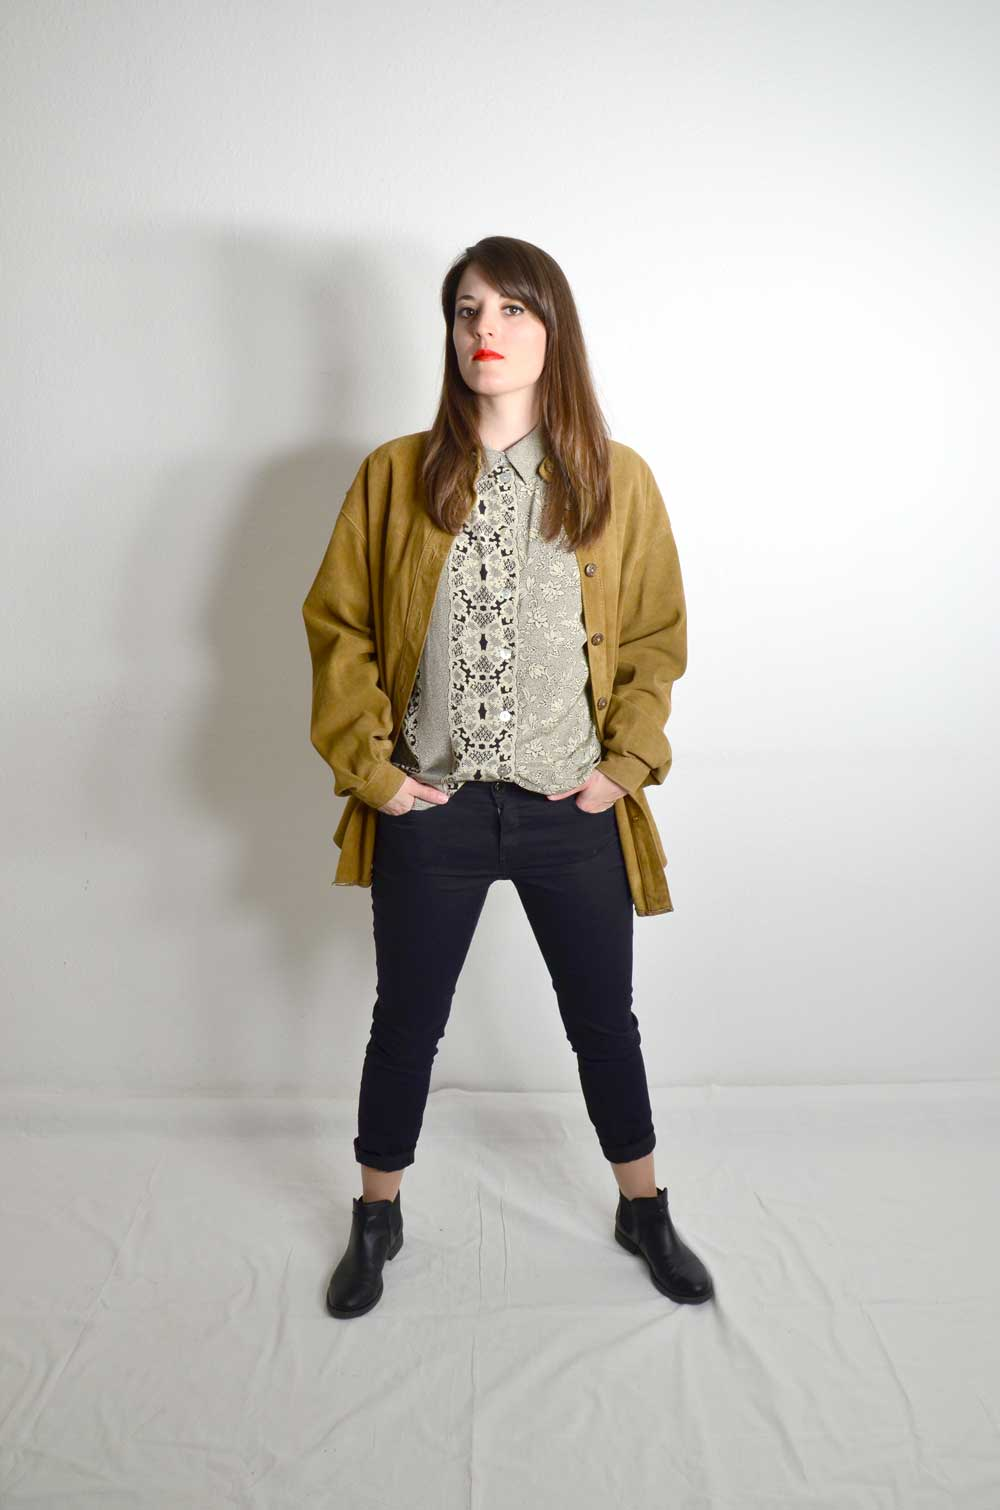 Powertrip Damen Vintage Lederjacke